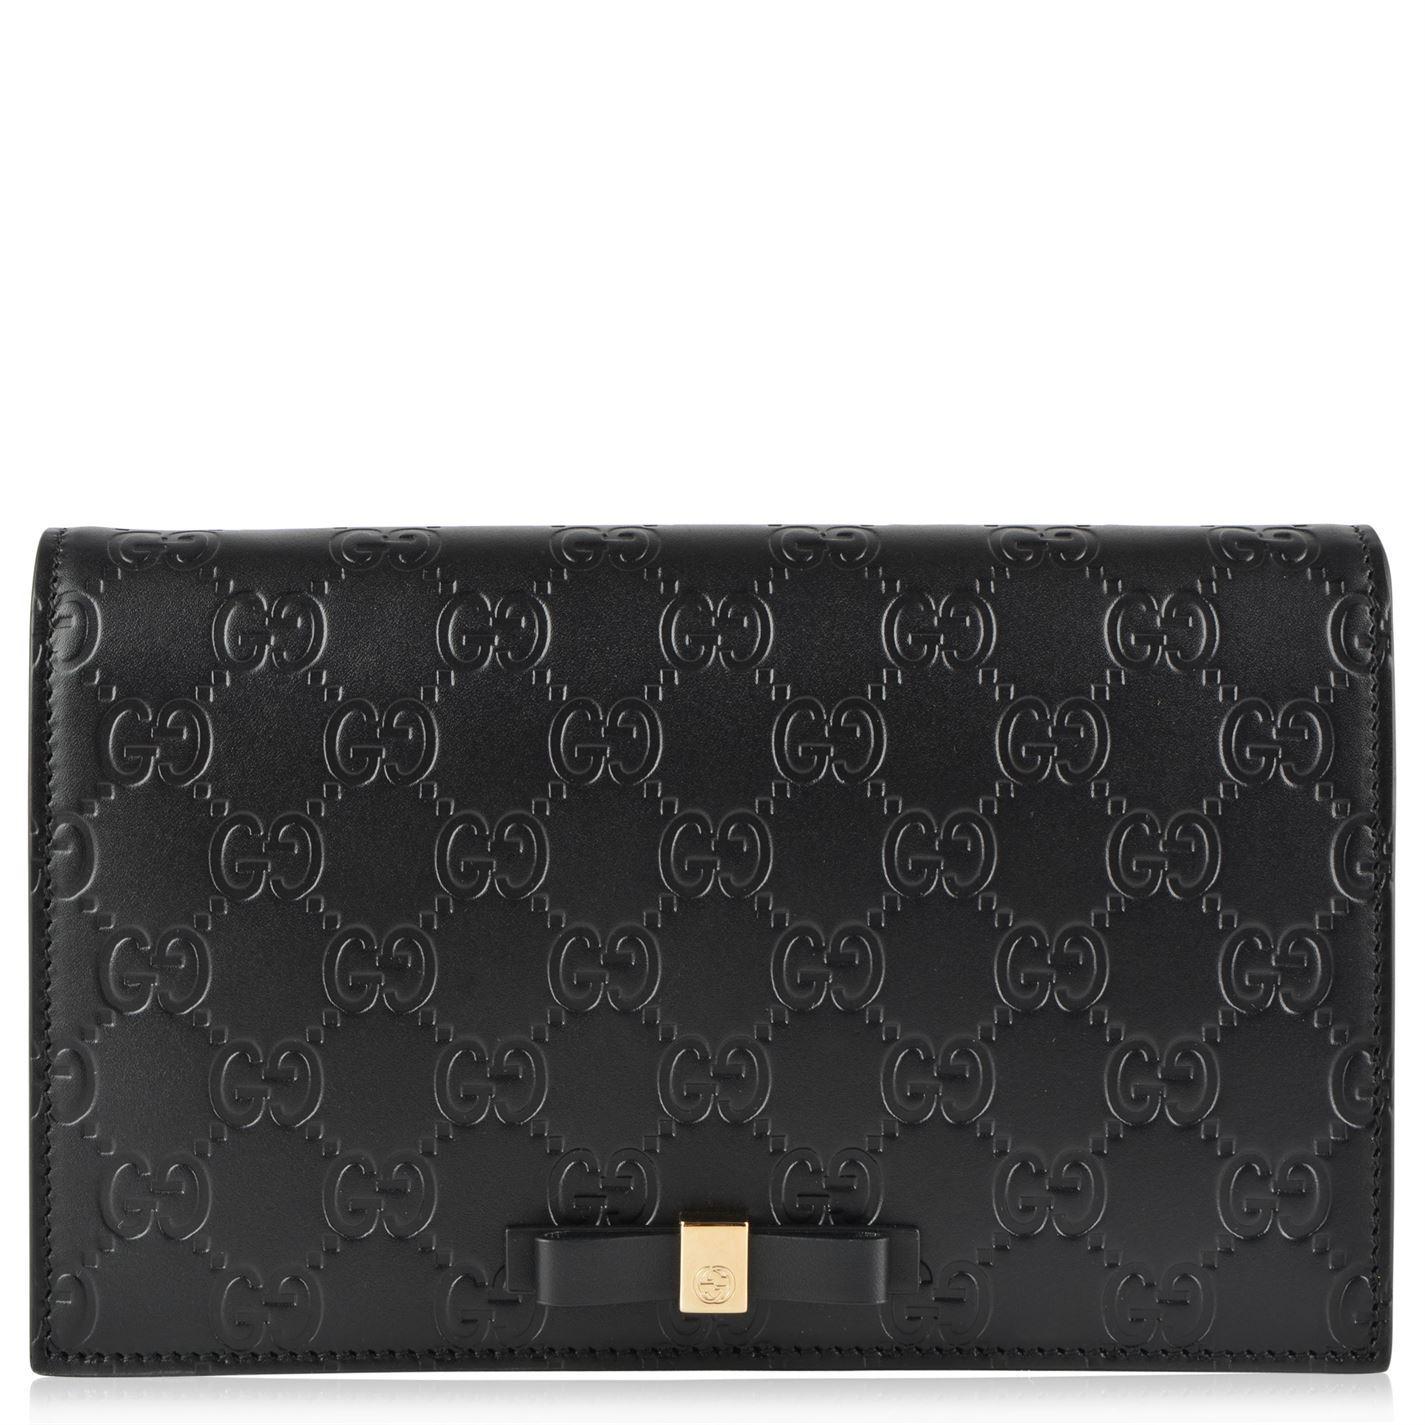 07003ba186a Gucci Gg Bow Shoulder Bag in Black - Lyst